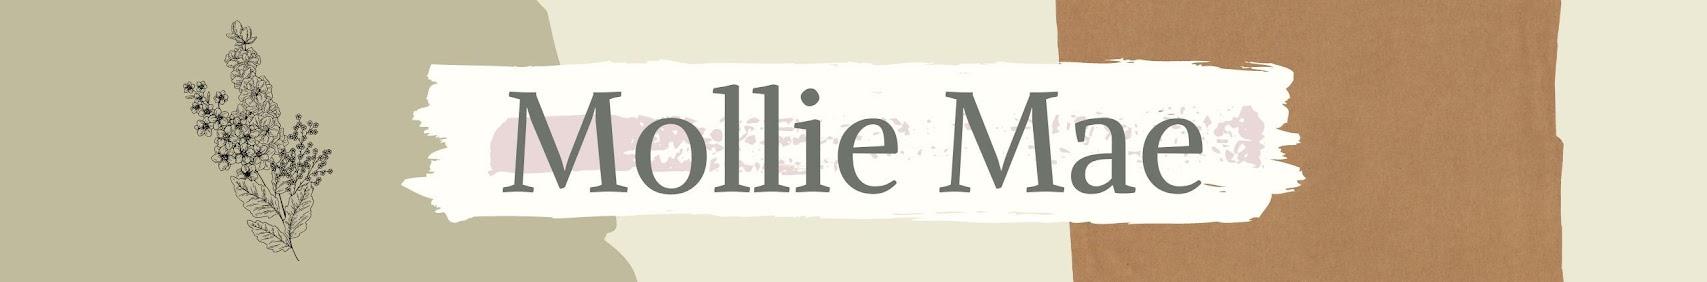 Mollie Mae